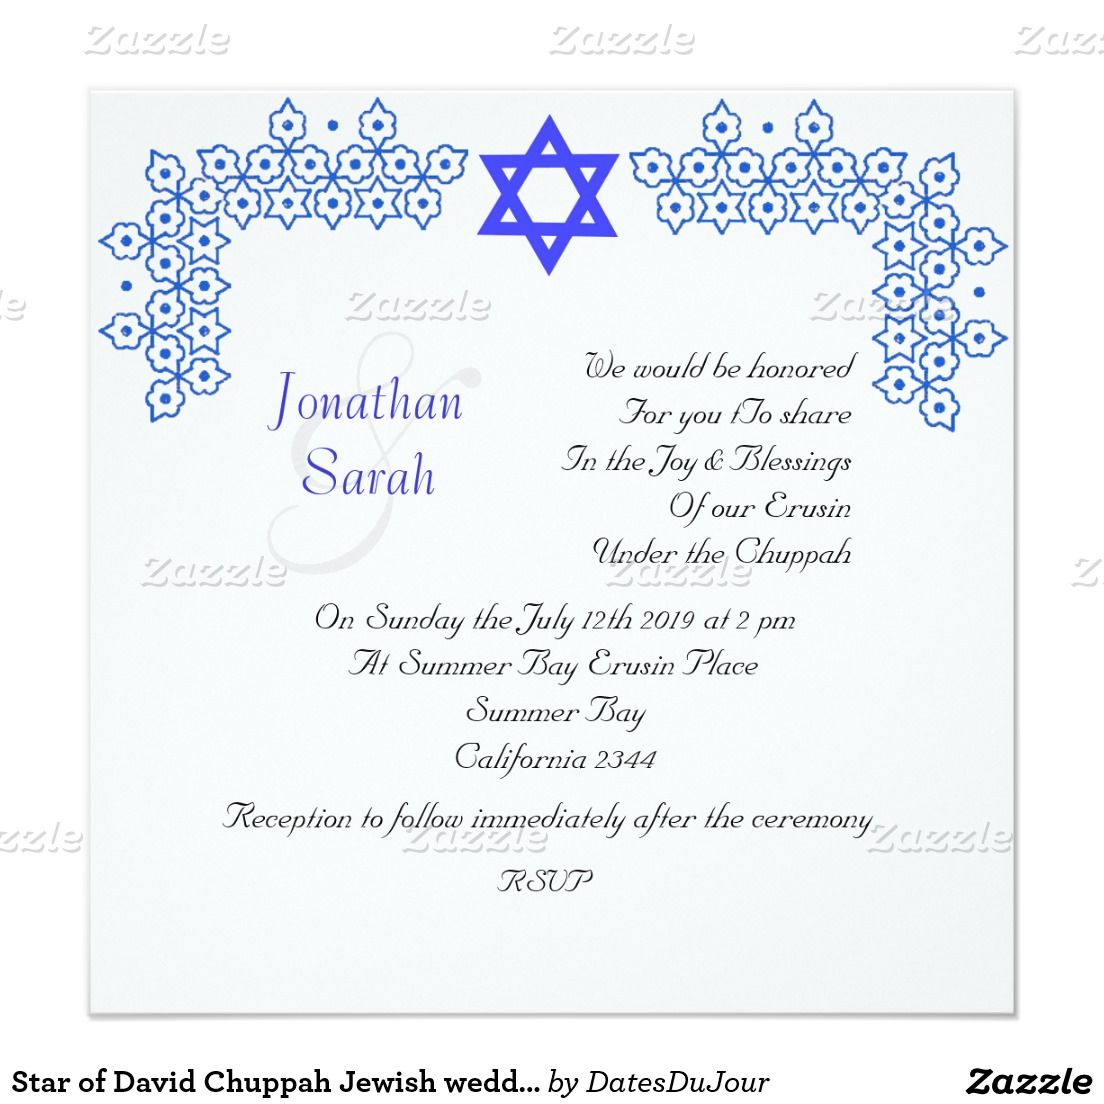 Star of David Chuppah Jewish wedding Card | Chuppah, Wedding card ...